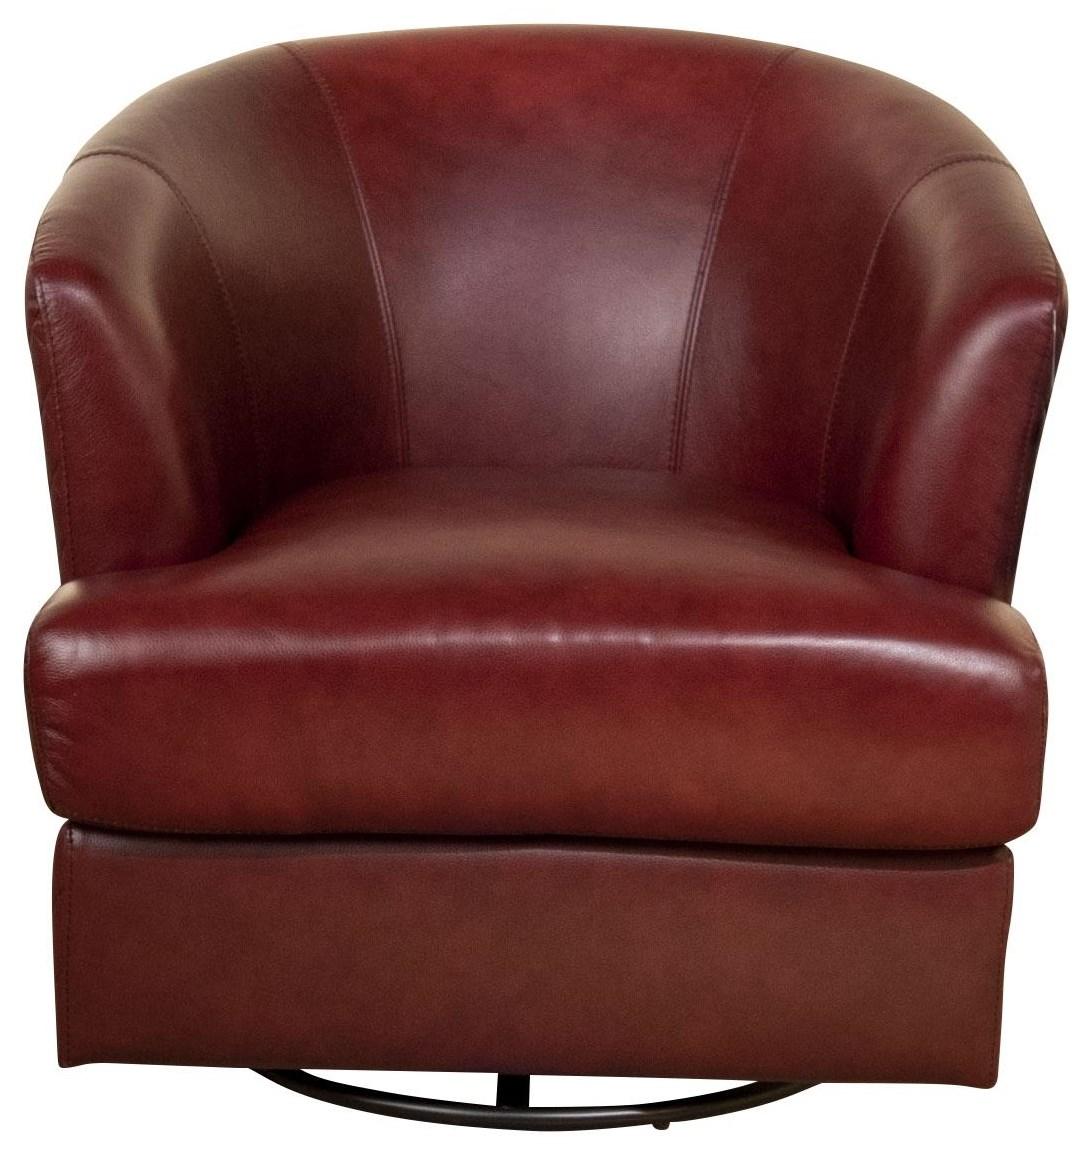 Lianna Lianna Leather Swivel Chair by Abbyson at Morris Home